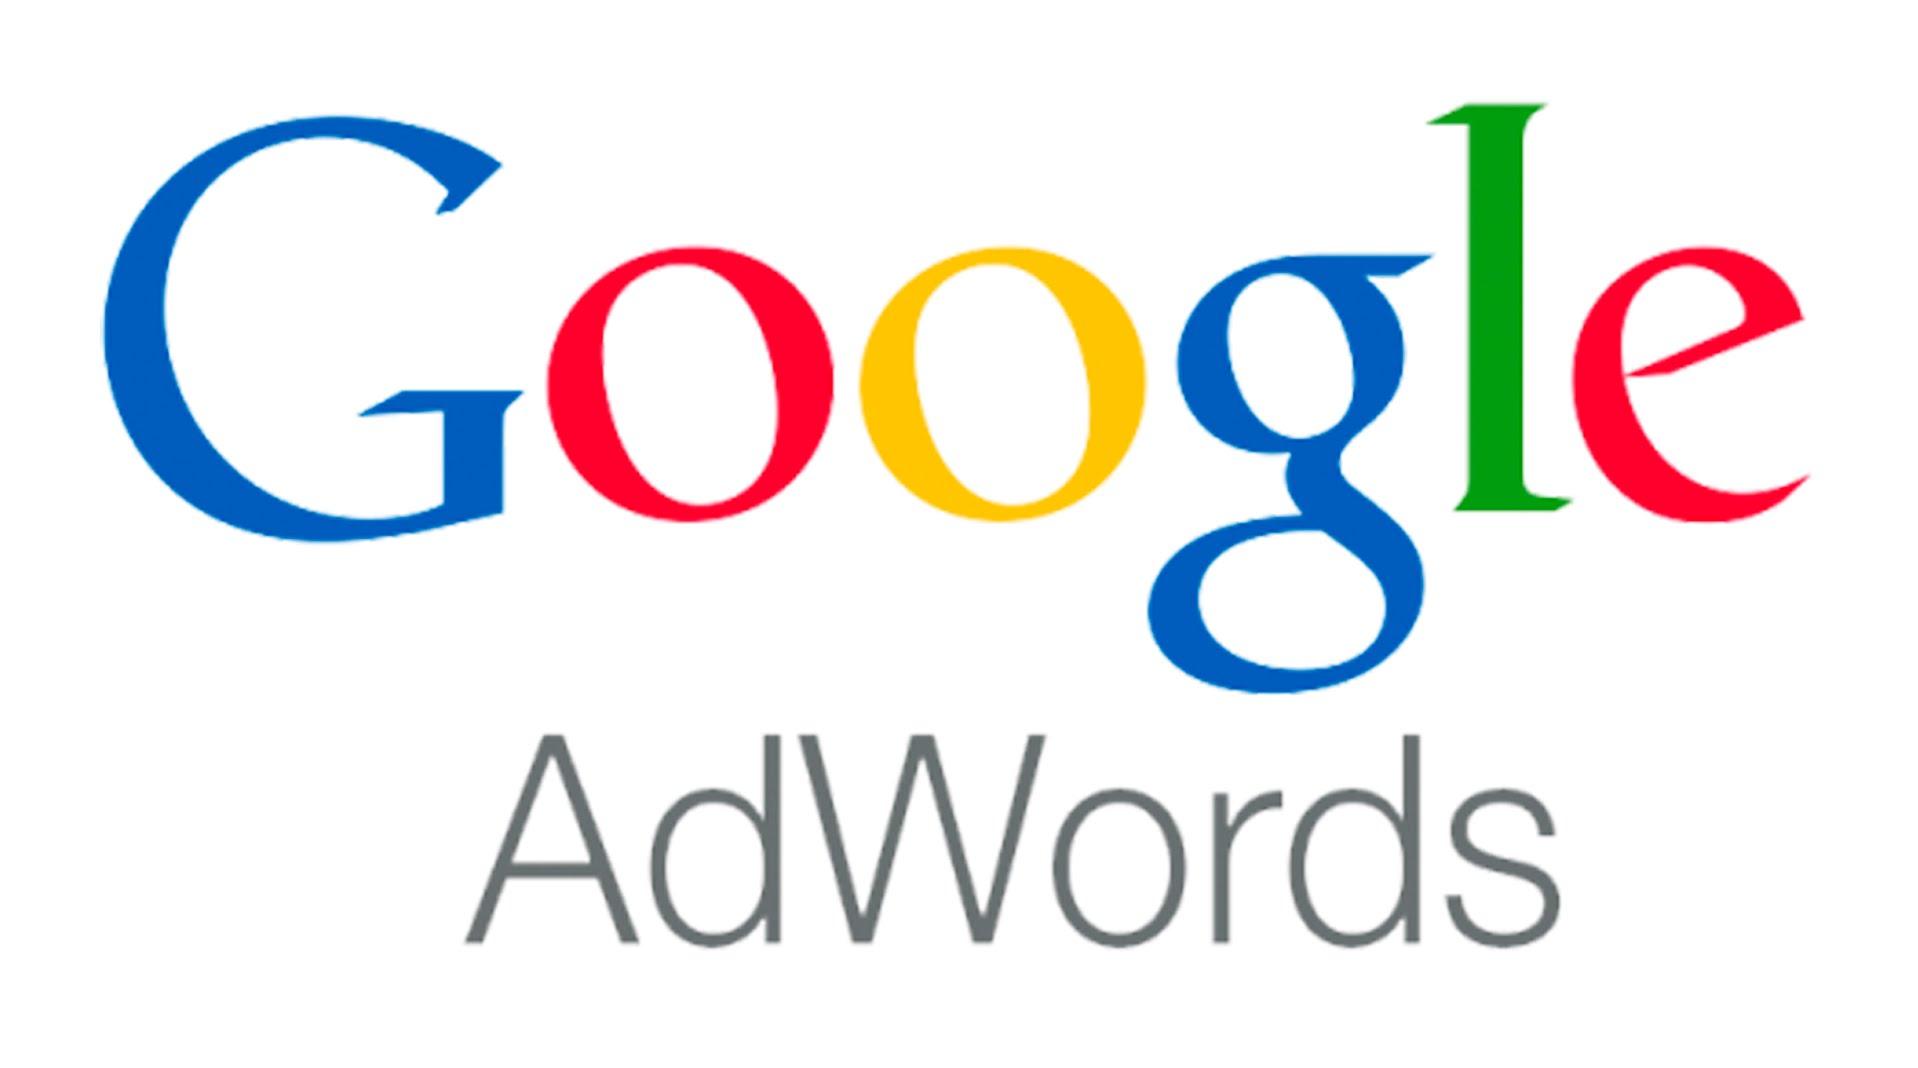 Google Adwords Email List Targeting, Google Adwords ...